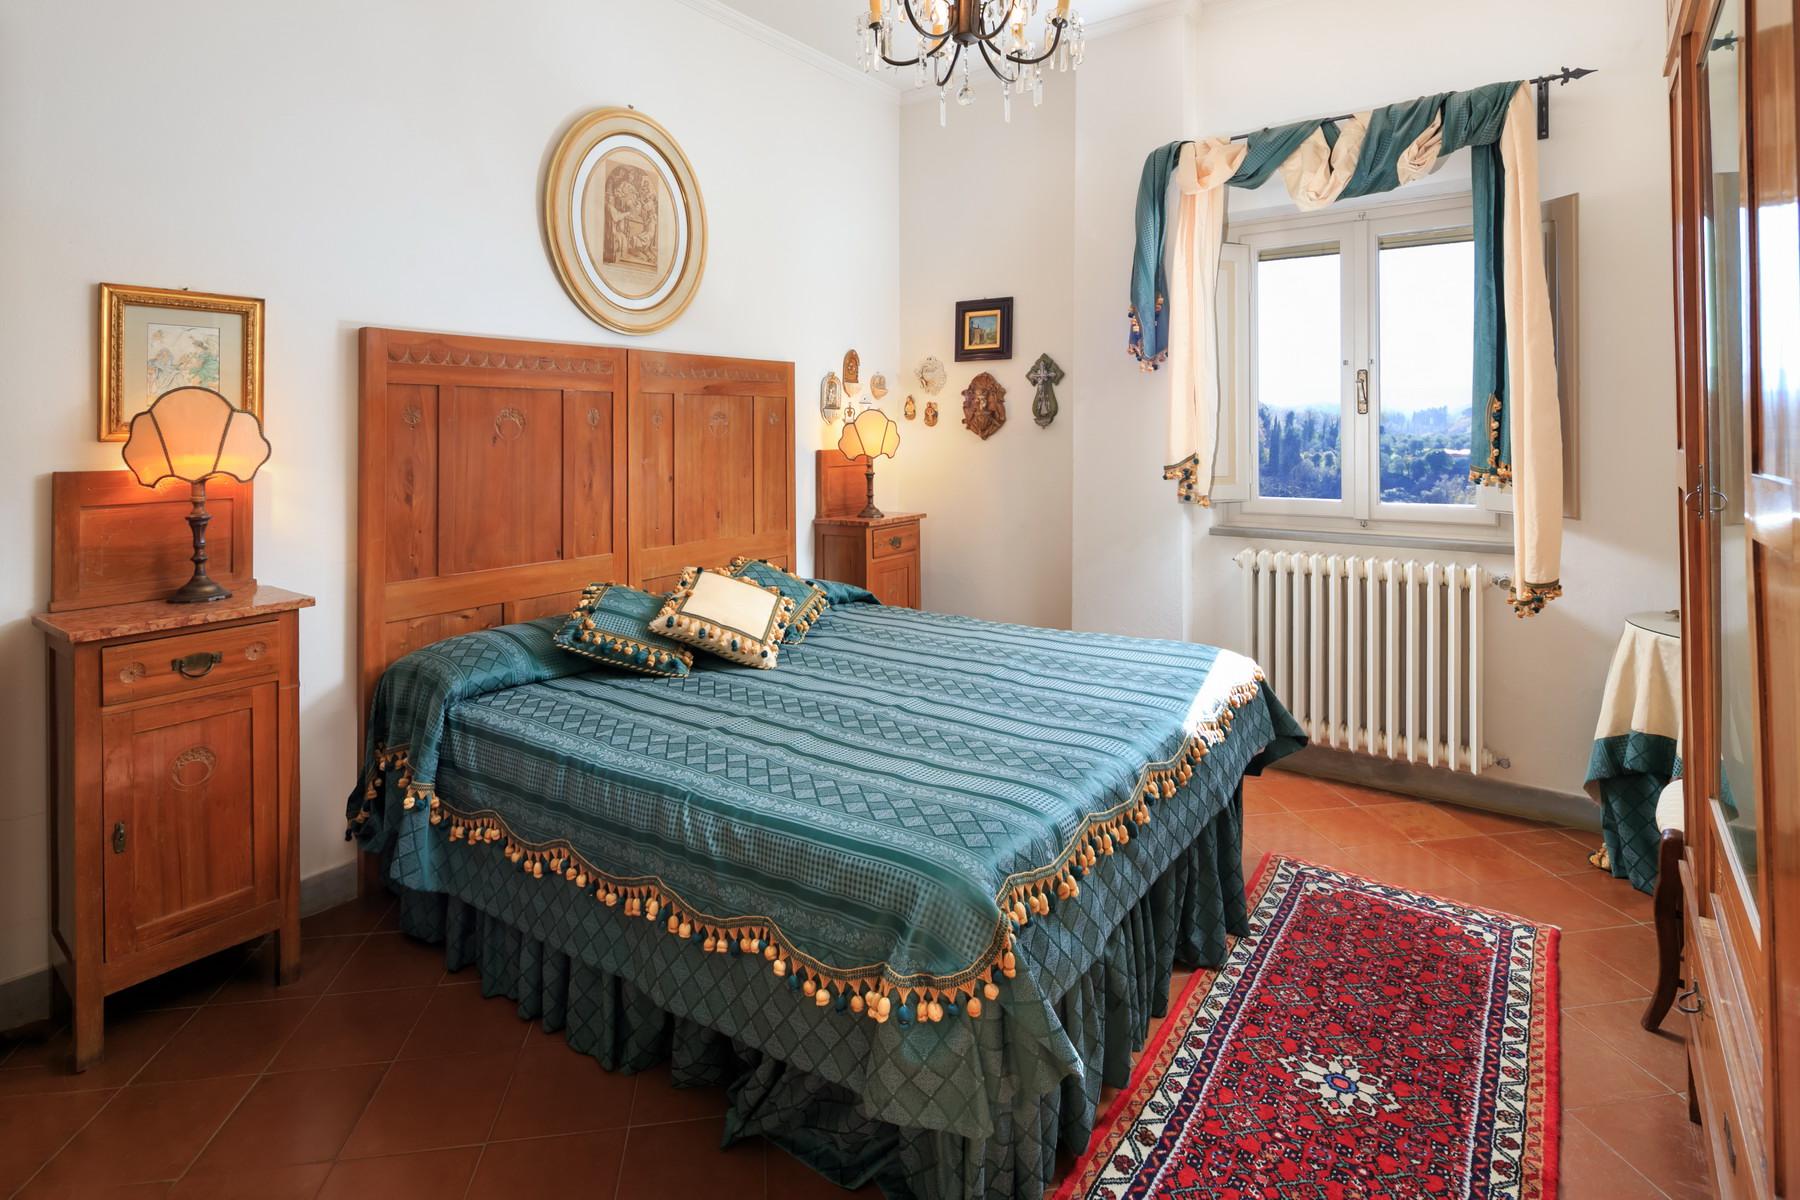 Villa in Vendita a Casciana Terme Lari: 5 locali, 550 mq - Foto 18